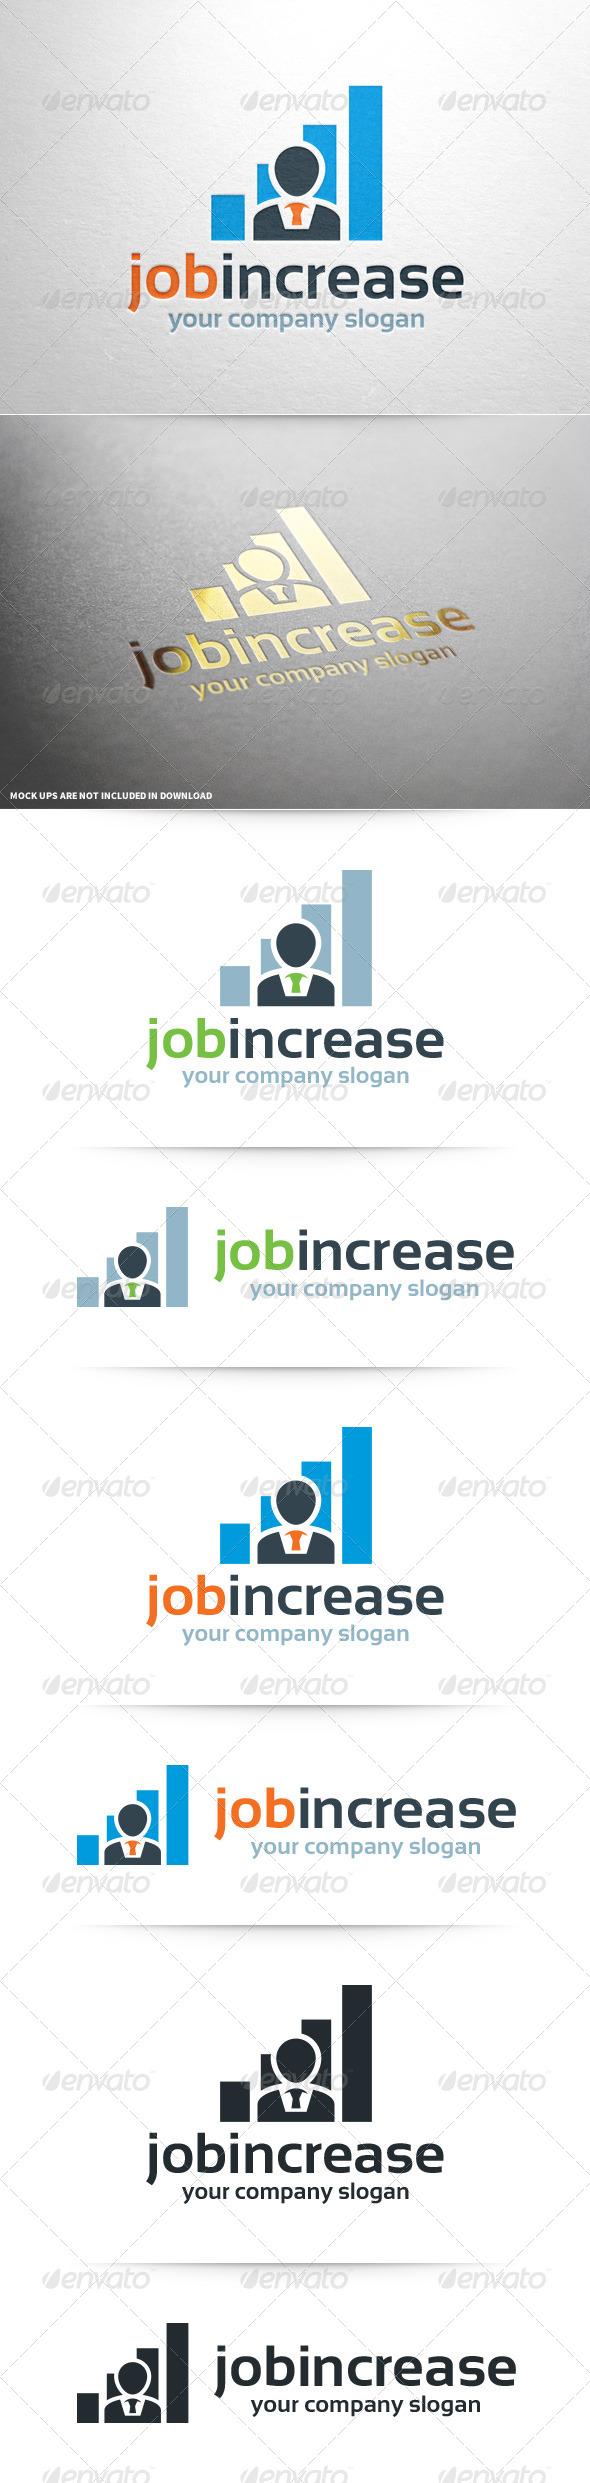 GraphicRiver Job Increase Logo Template 8092589